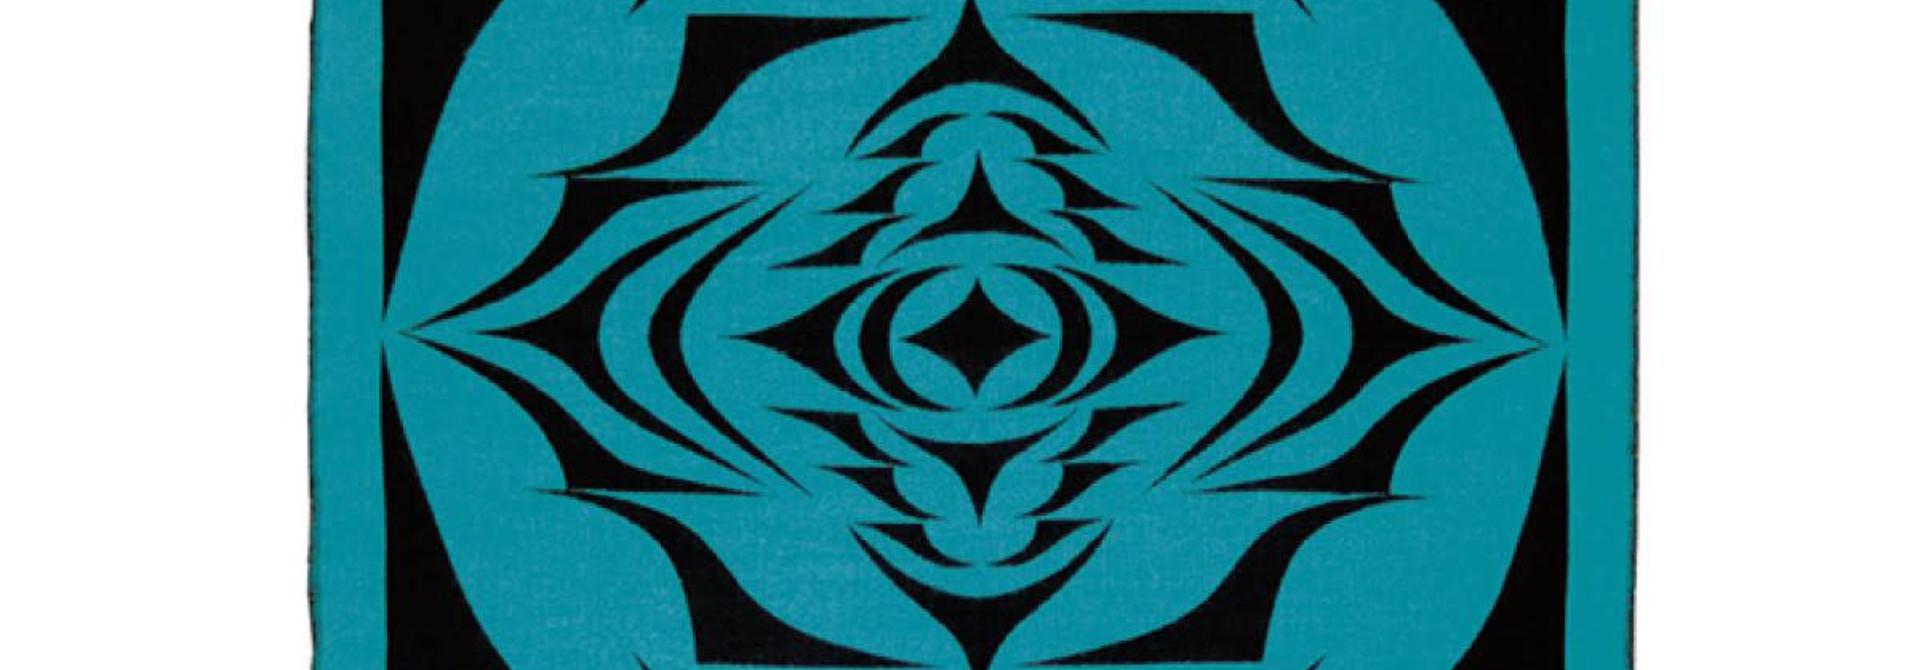 Woven Blanket-Salish Sunset by Simone Diamond